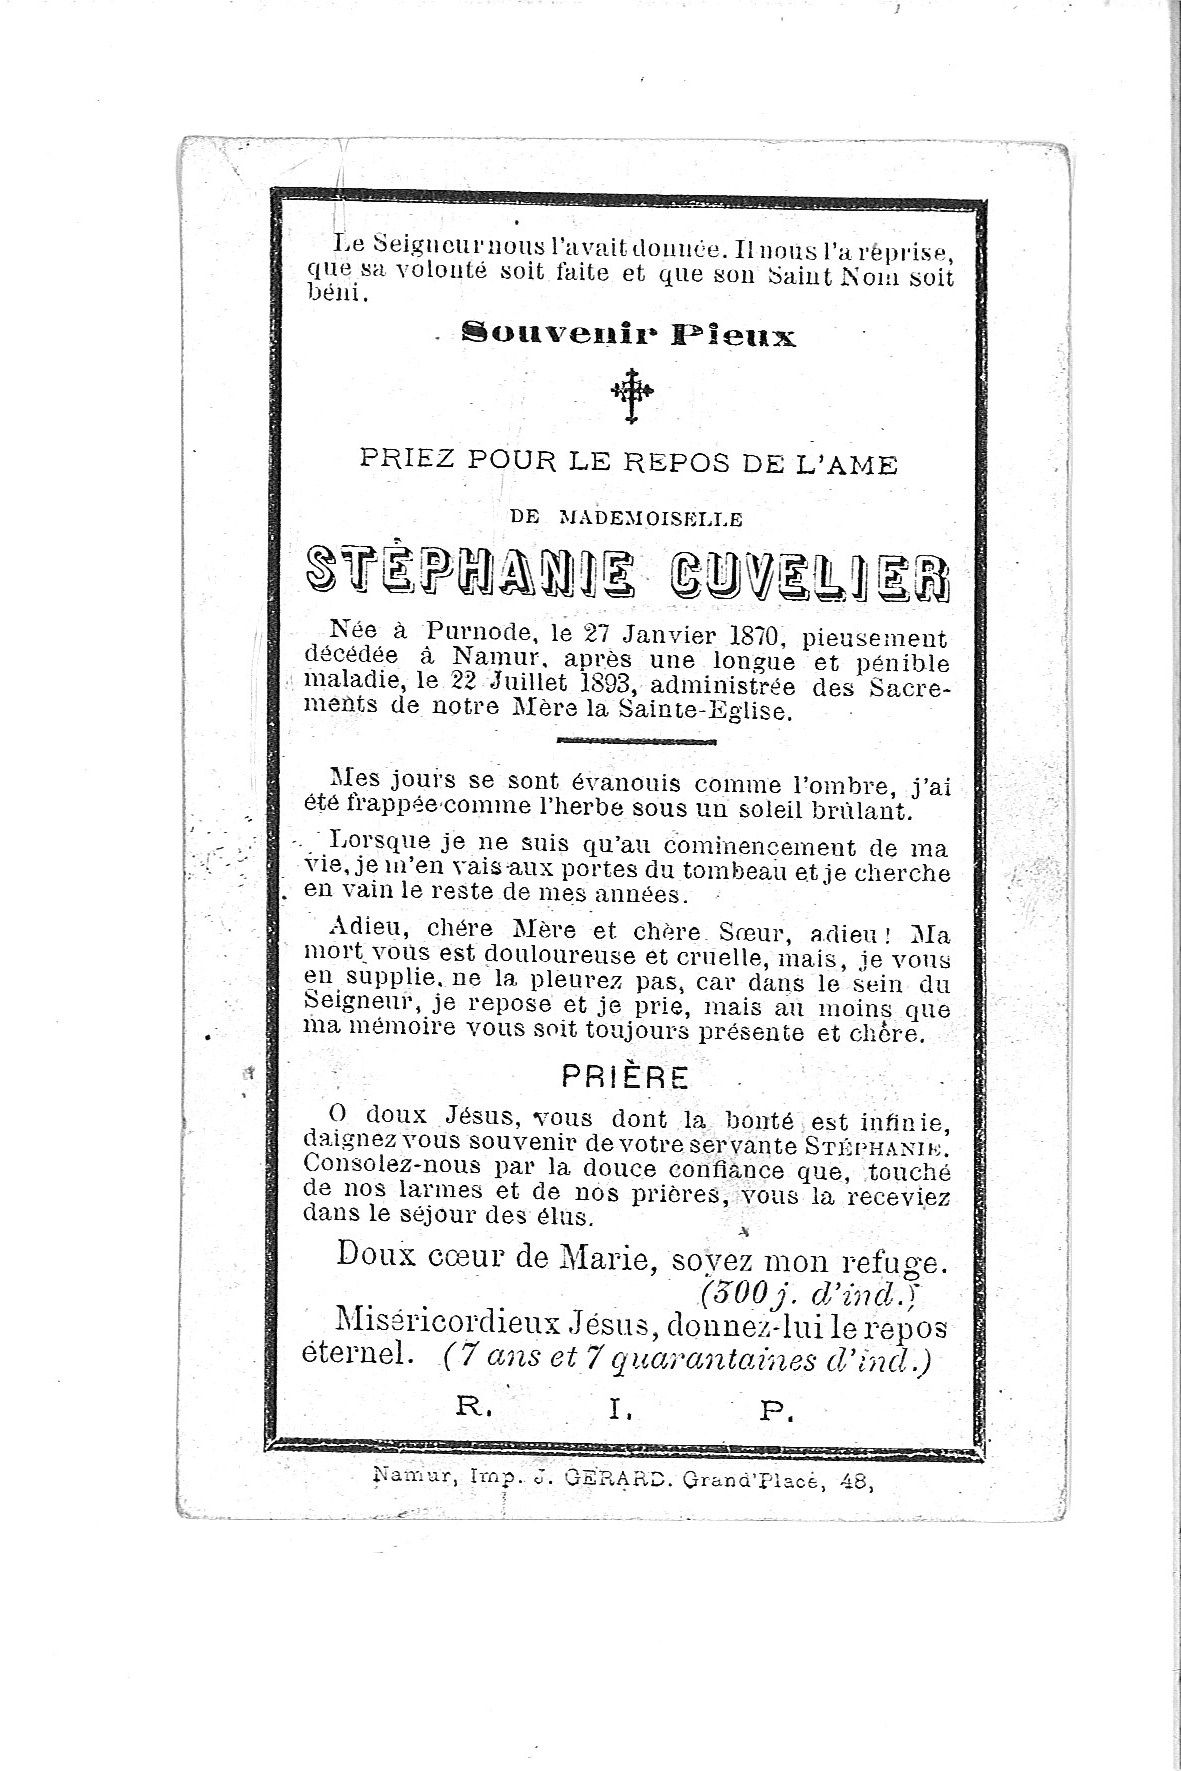 Stéphanie(1893)20090916171417_00058.jpg